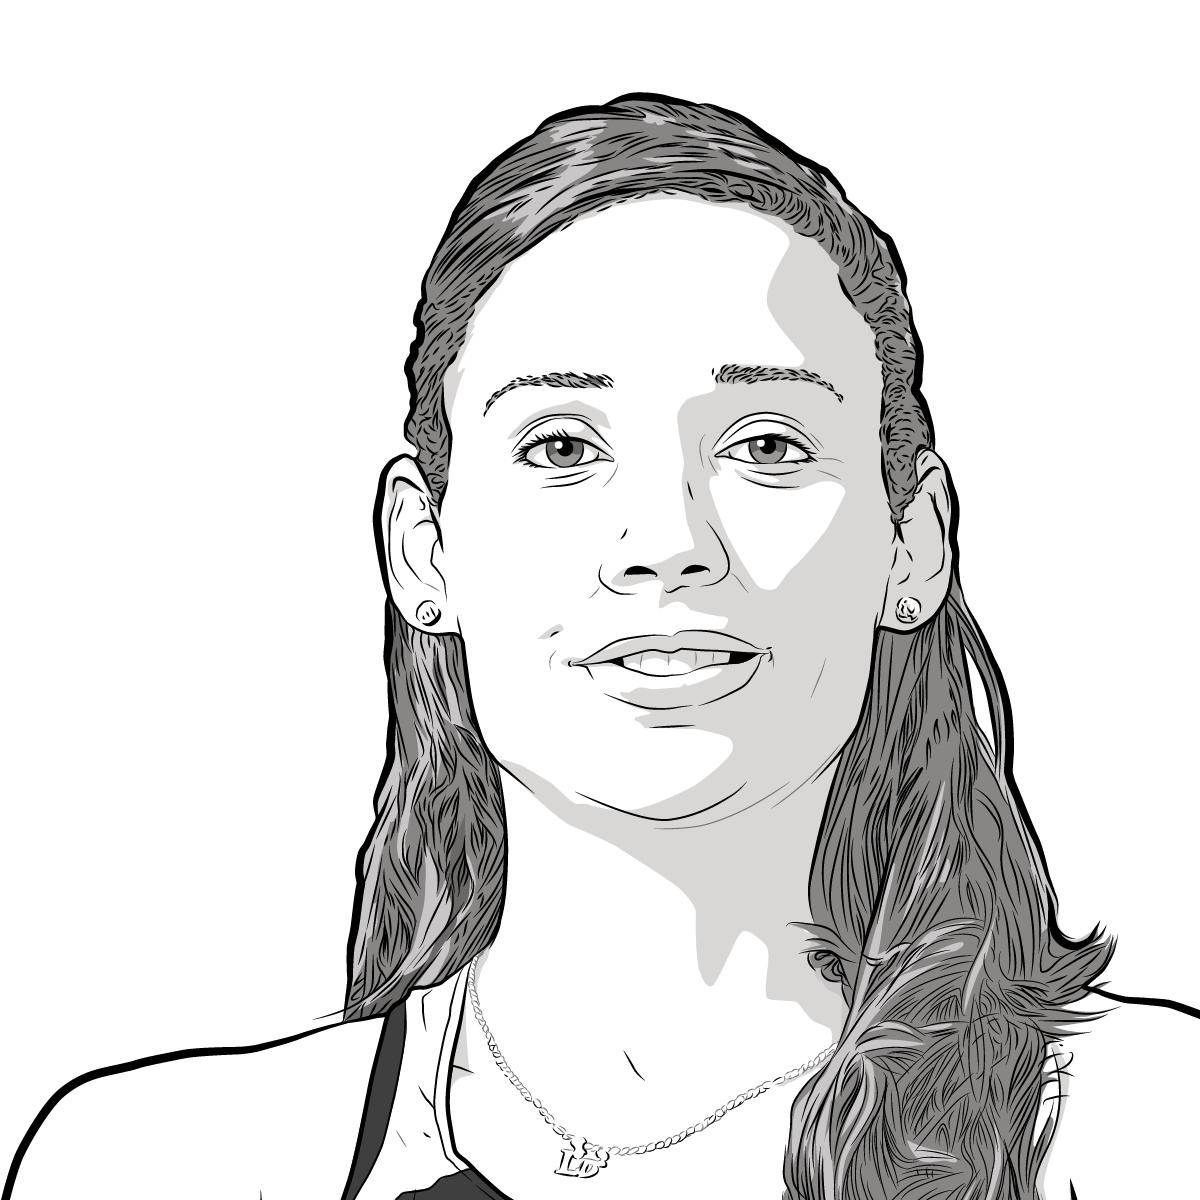 Athlete Portrait of Lolo Jones, illustration by Max Hancock